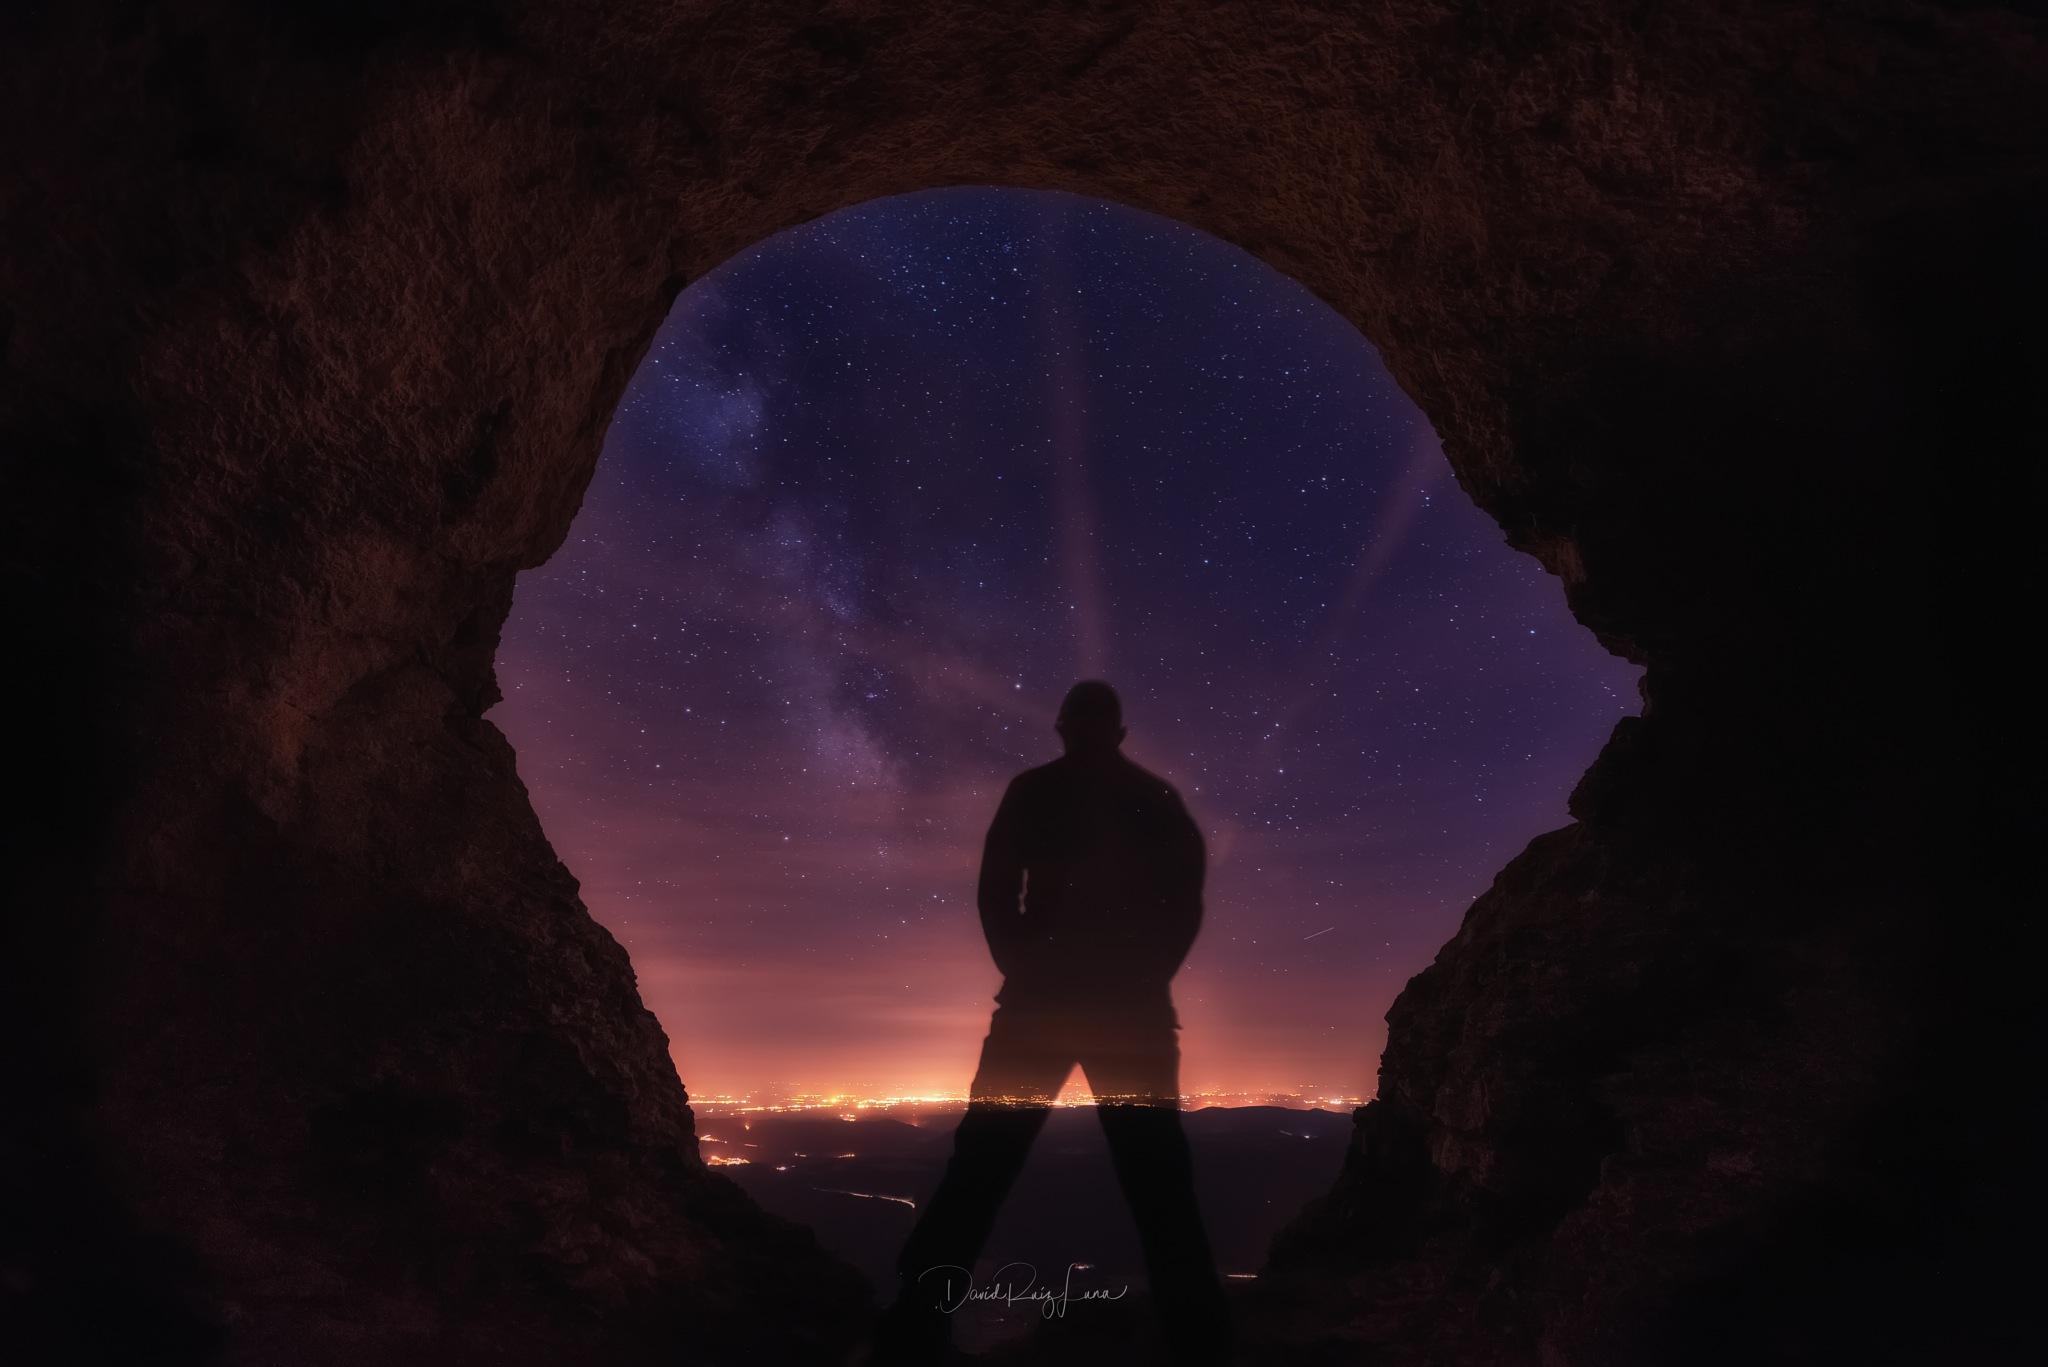 madness for night photography  by druizluna